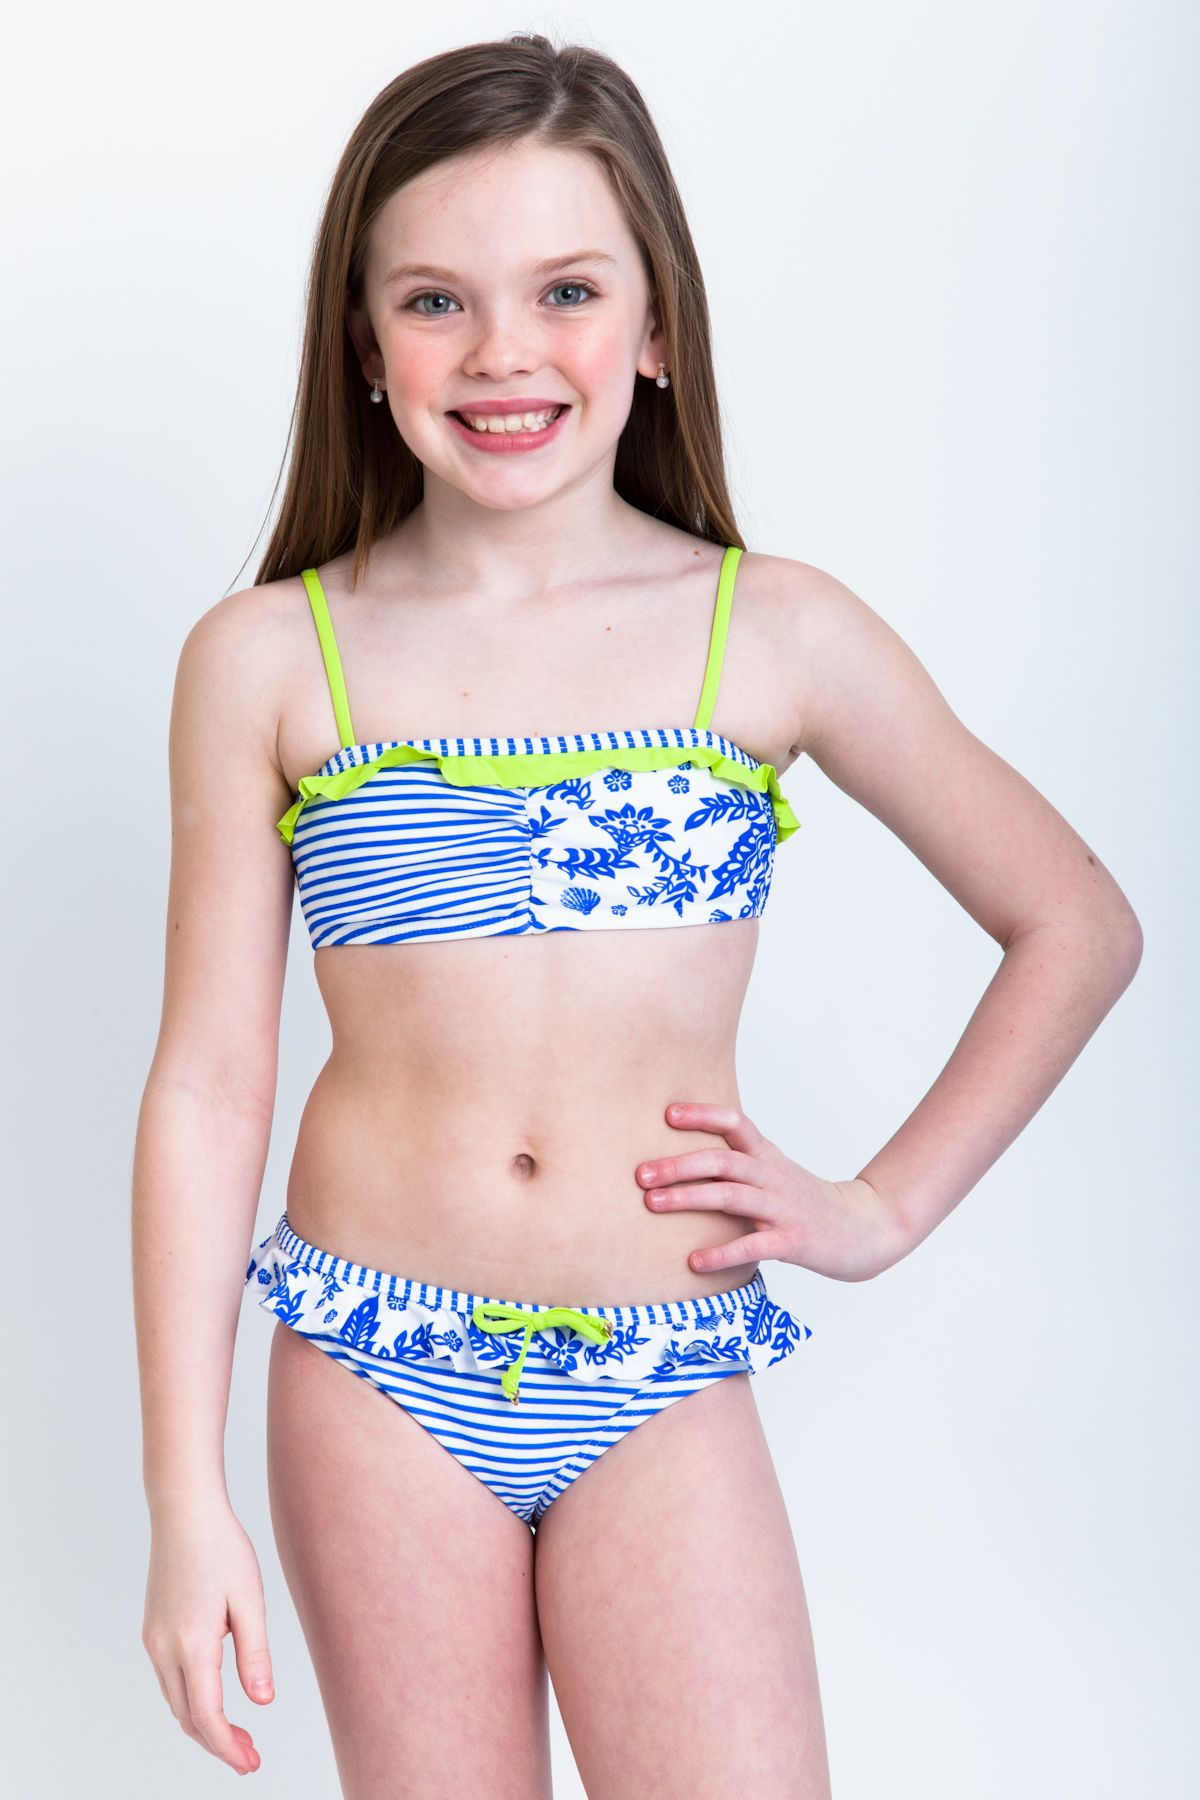 swimsuits for girls 2 jpg  1200 u00d71800  car pinterest cars LED Trailer Light Wiring Diagram 4 Pole Trailer Wiring Diagram